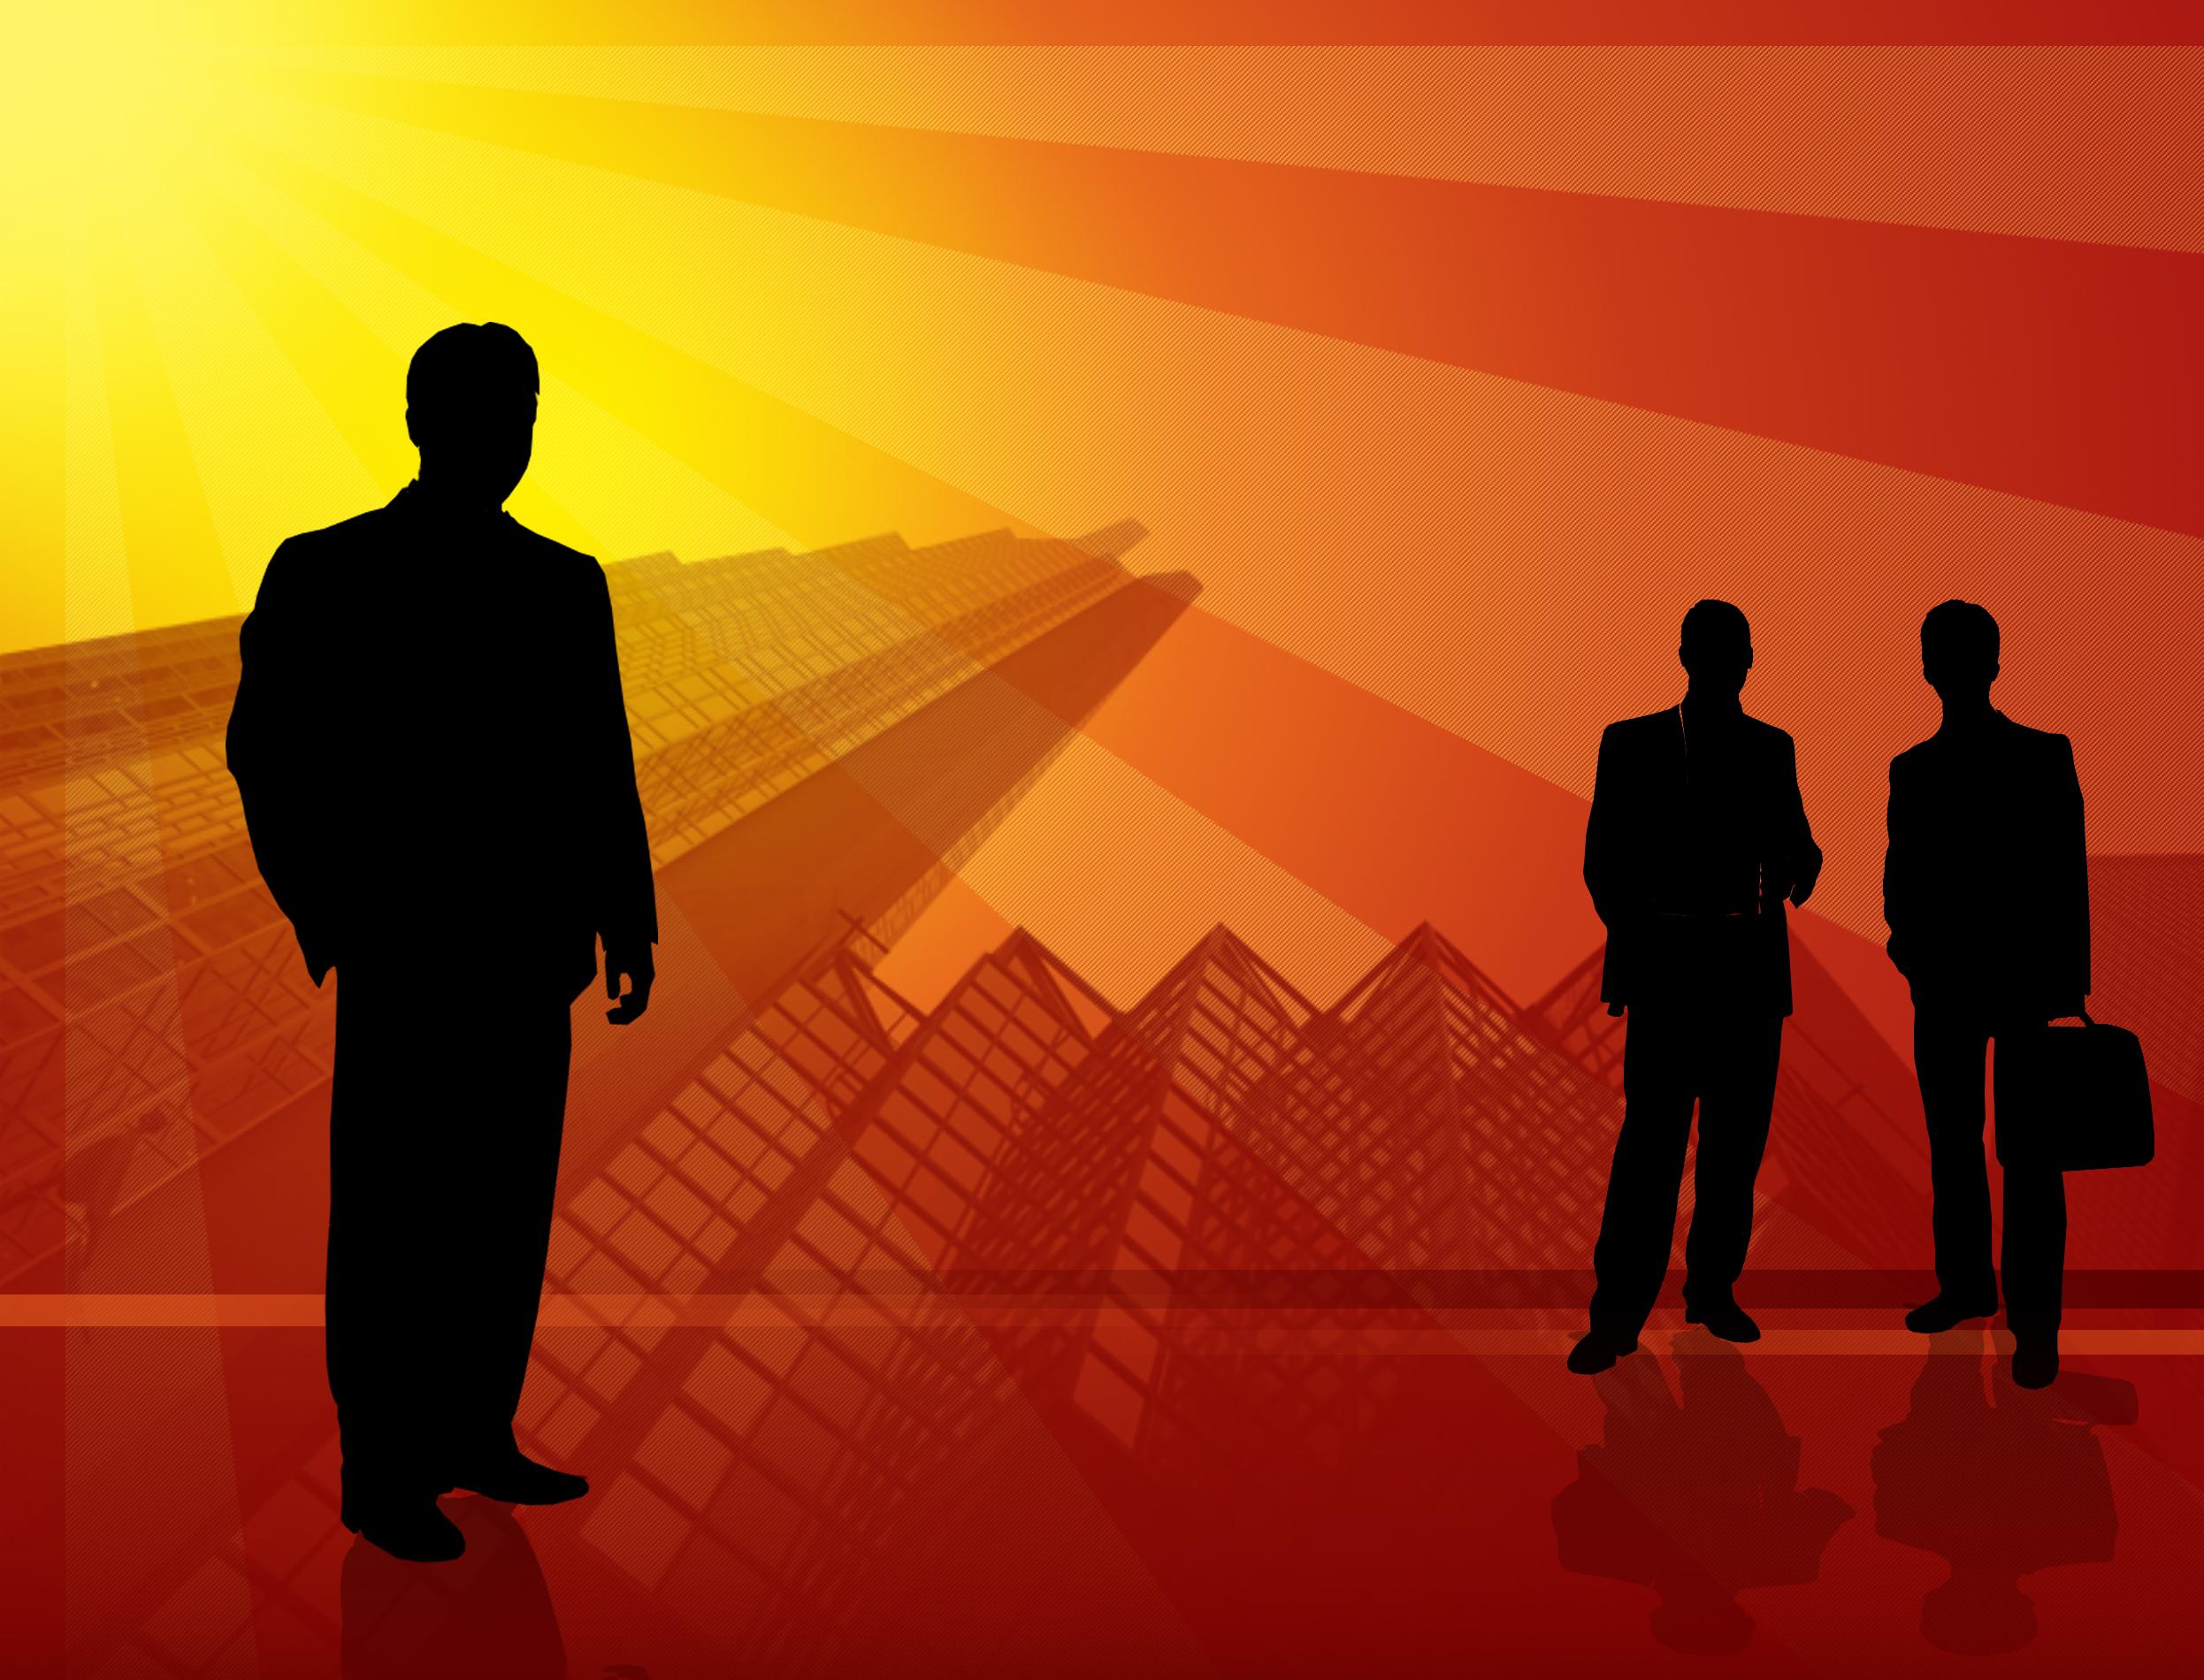 Entrepreneurs' optimism soars